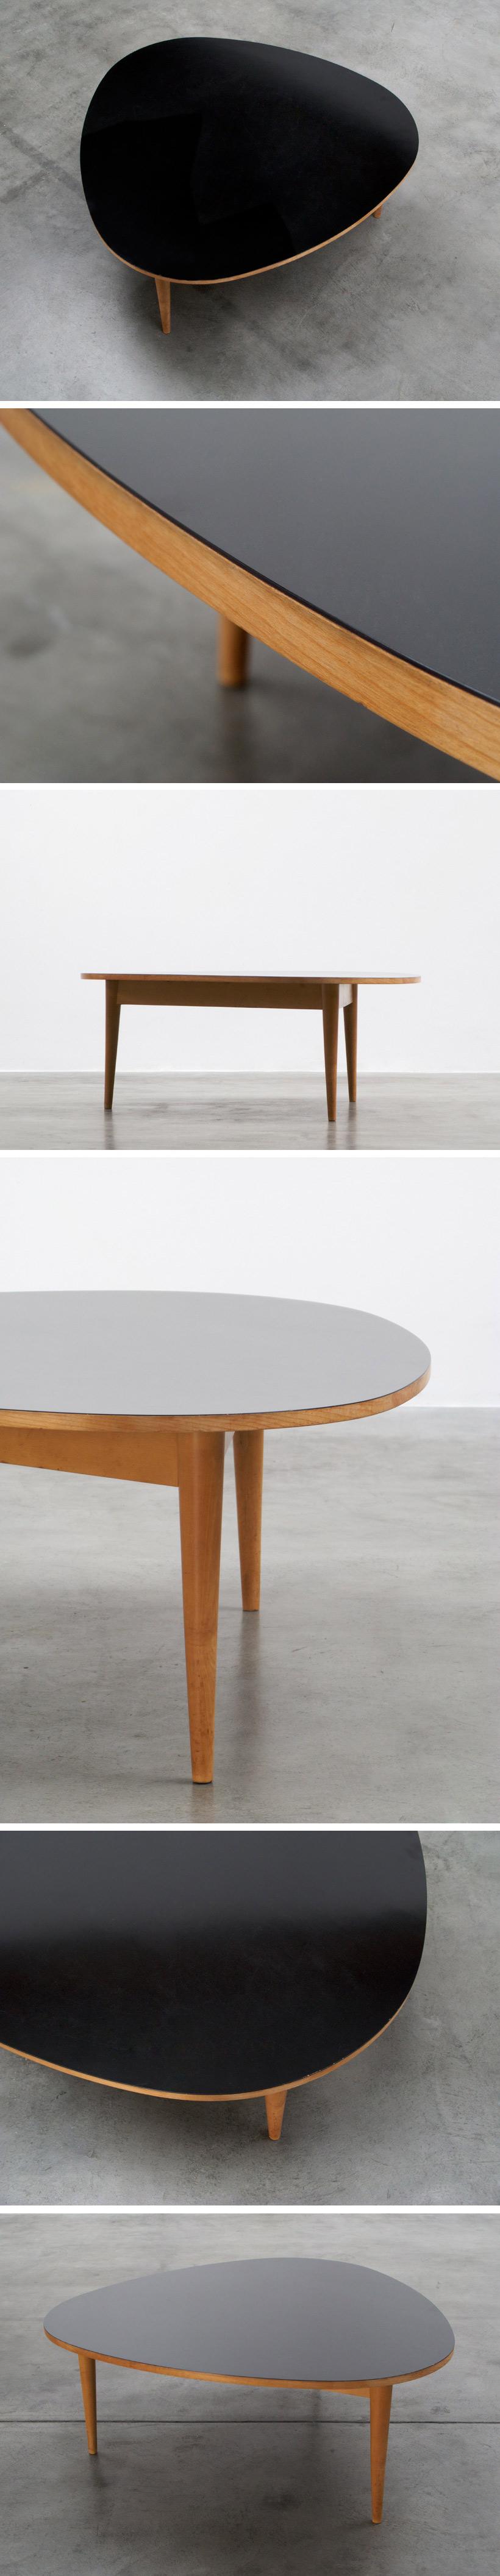 Max Bill Three-round coffee table Wohnbedarf AG Zurich Large